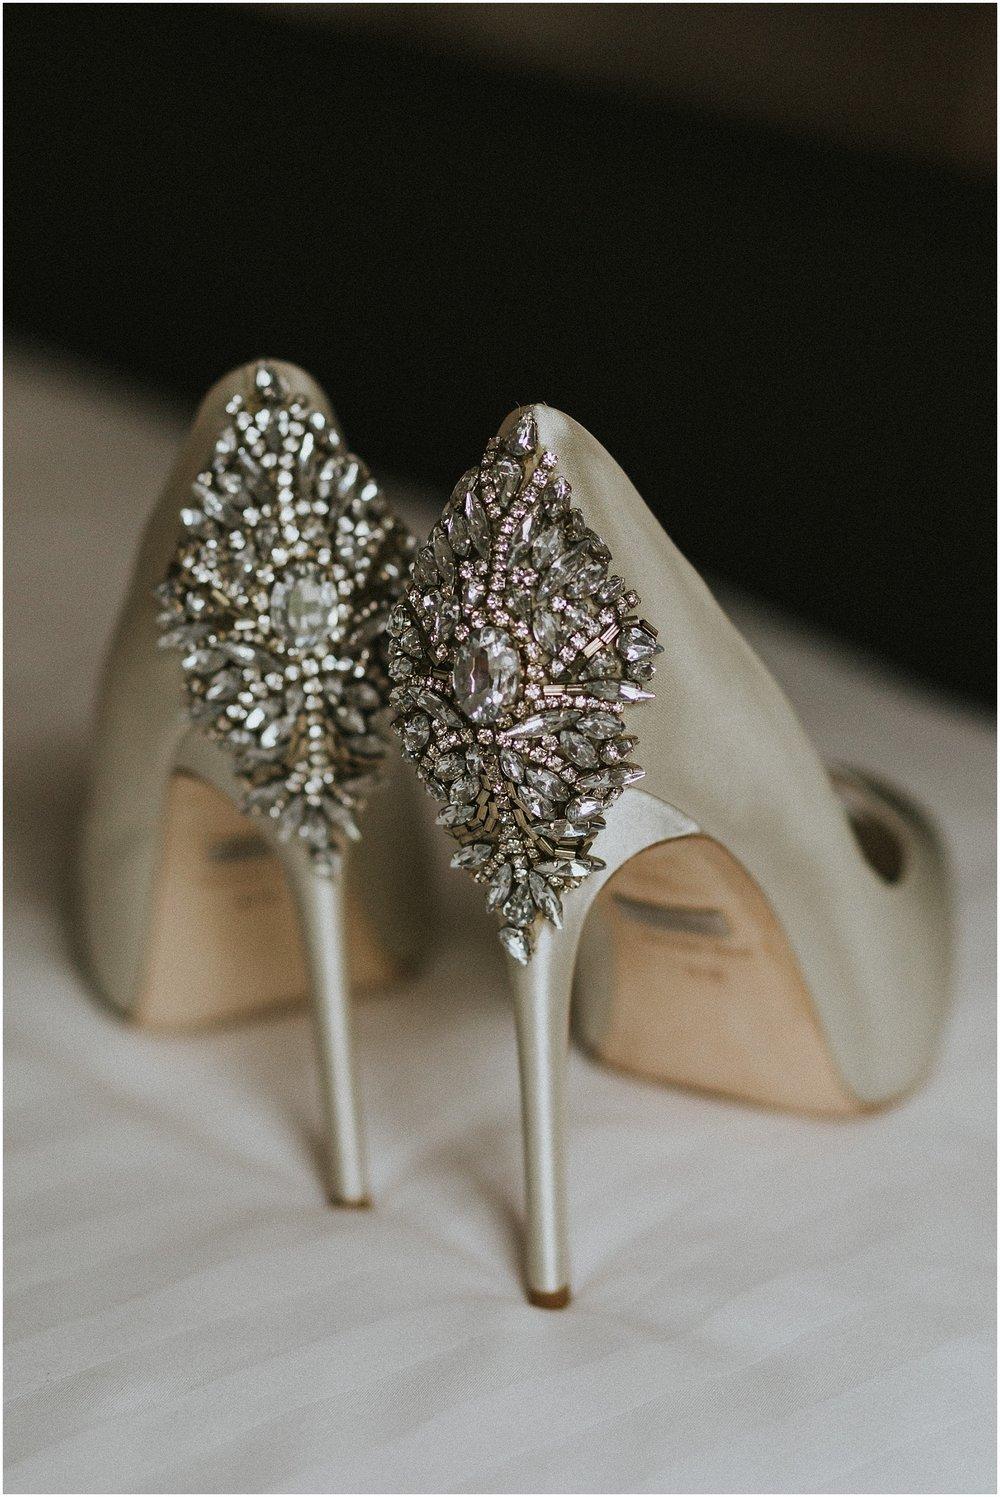 Badgley Mischka diamond wedding shoes at The Historic Acres of Hershey in Hershey Pennsylvania